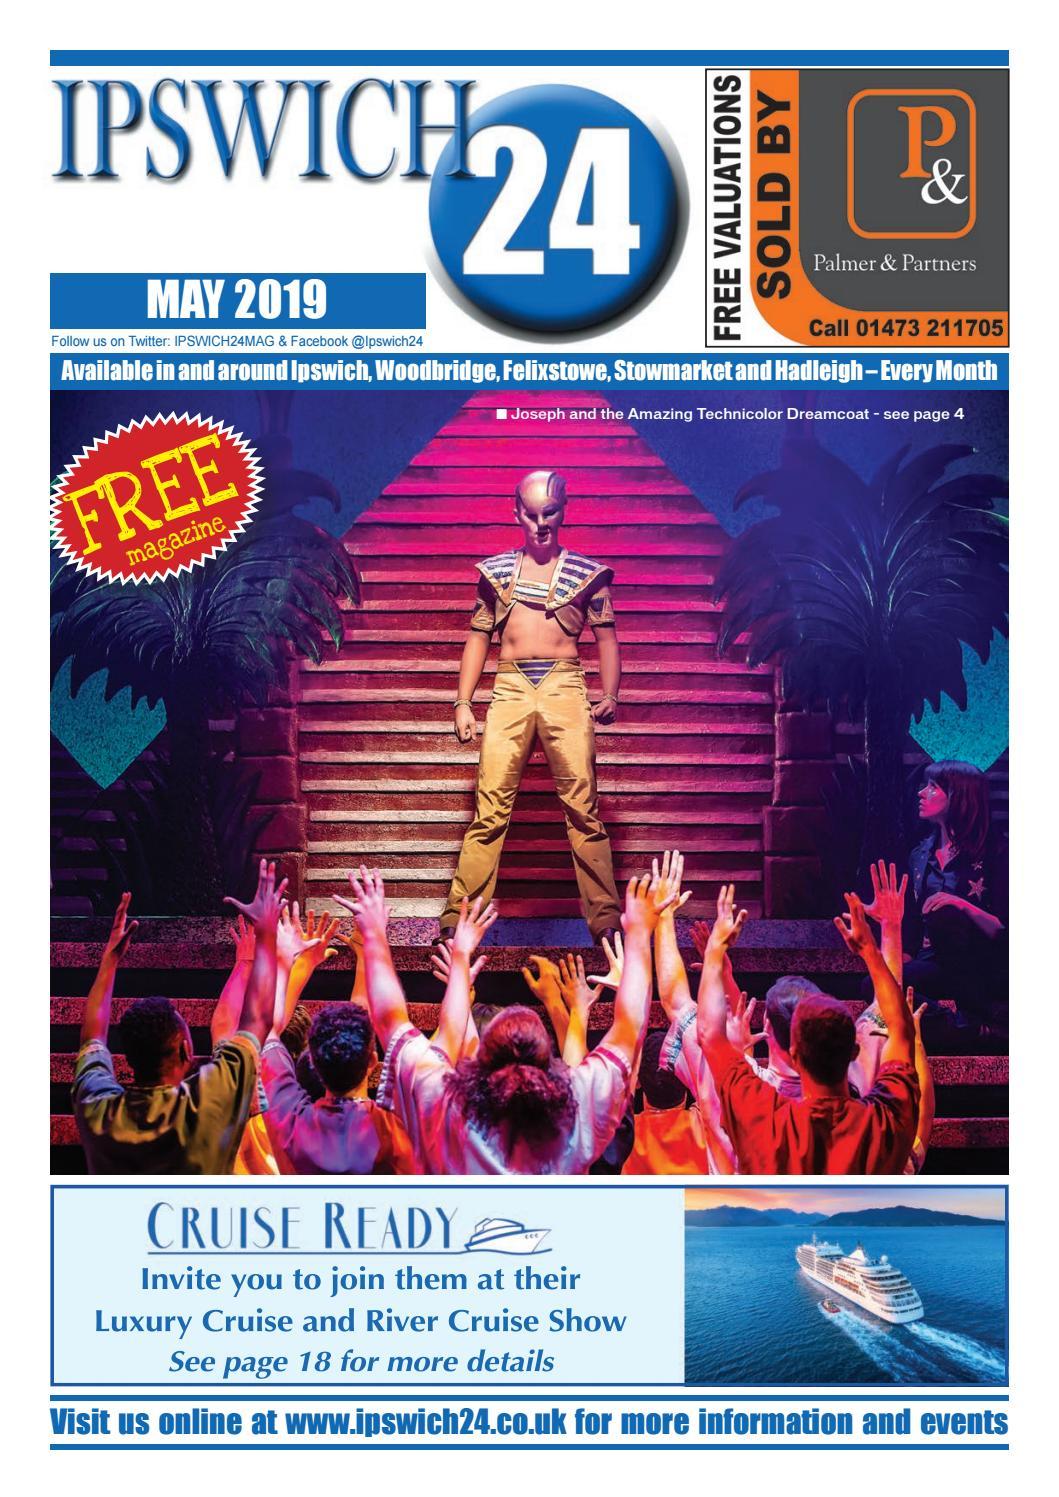 f0277cdf29e Ipswich24 Magazine - May 2019 by Ipswich24 Magazine - issuu